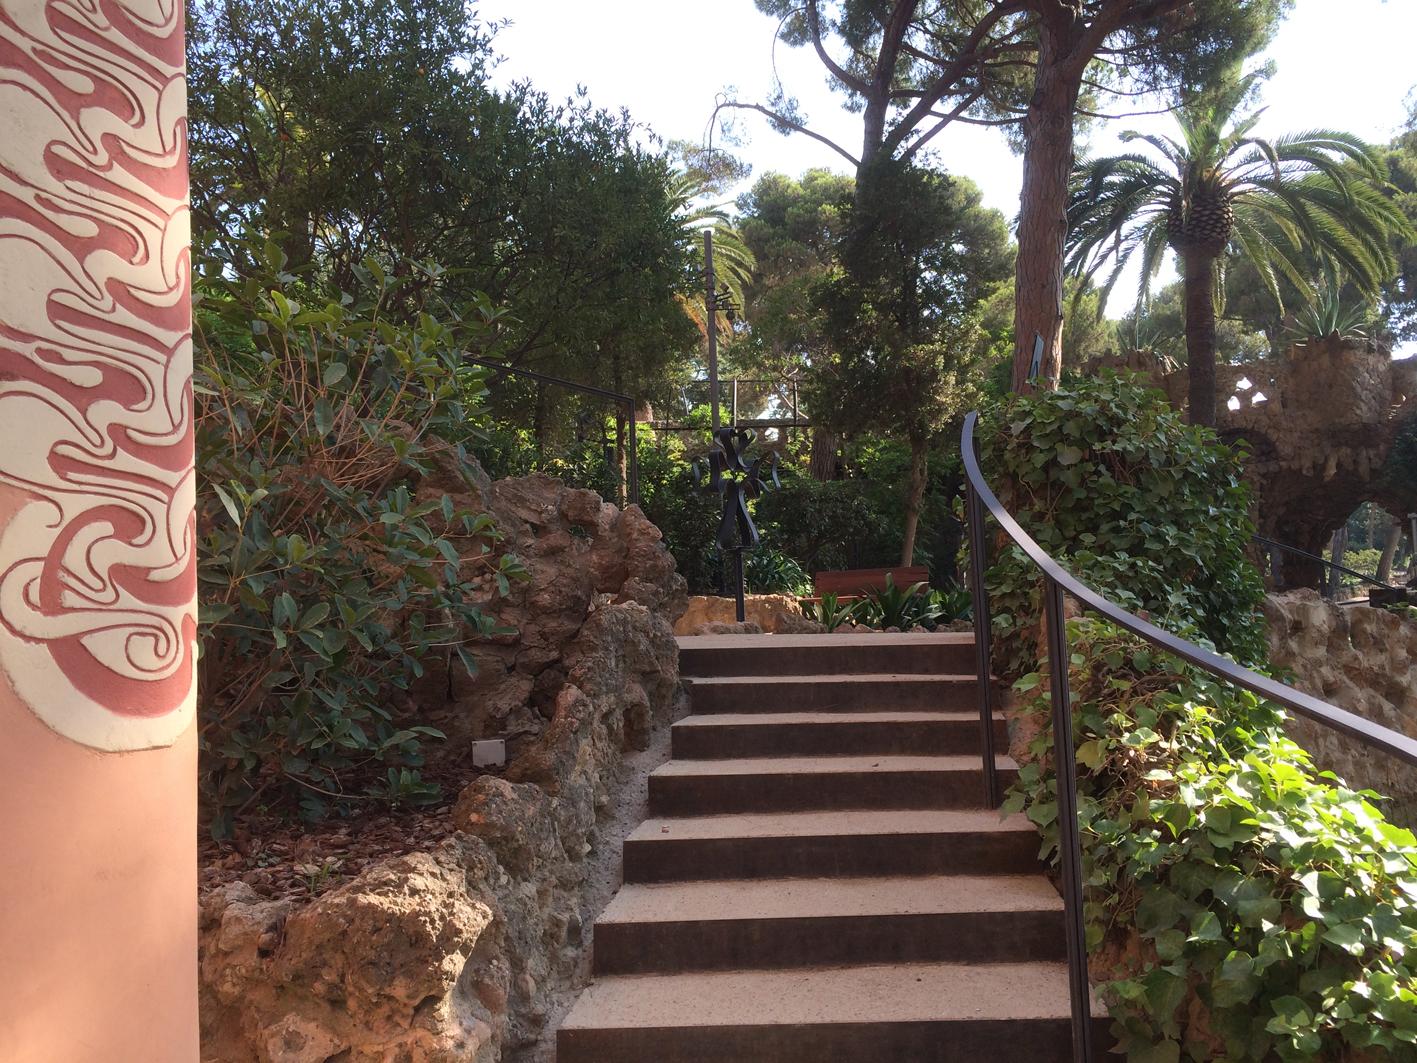 Casa Museu Gaudí Garden - Park Güell, Barcelona